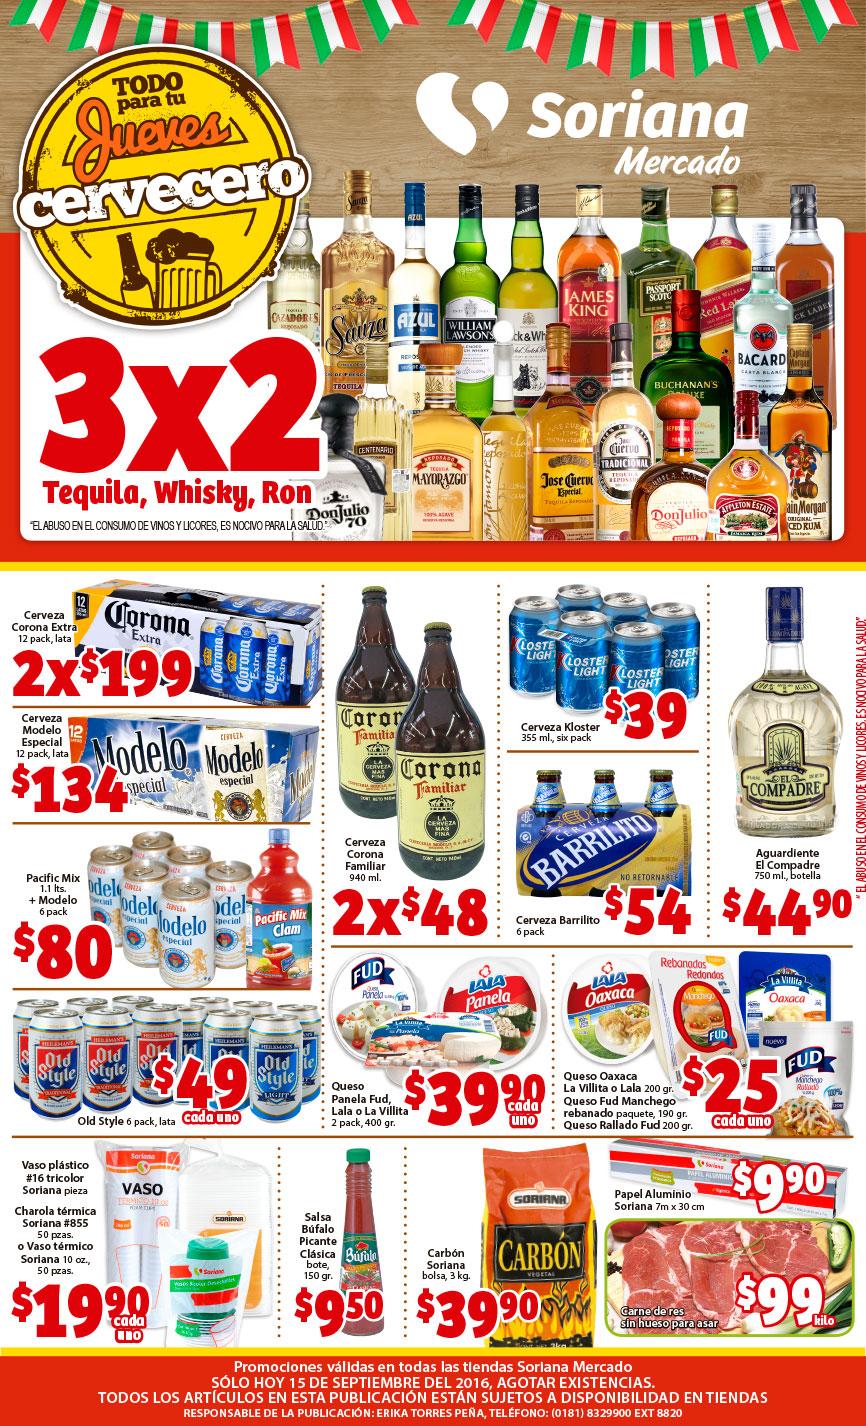 Soriana Mercado: 3x2 Tequila, Whisky y Ron